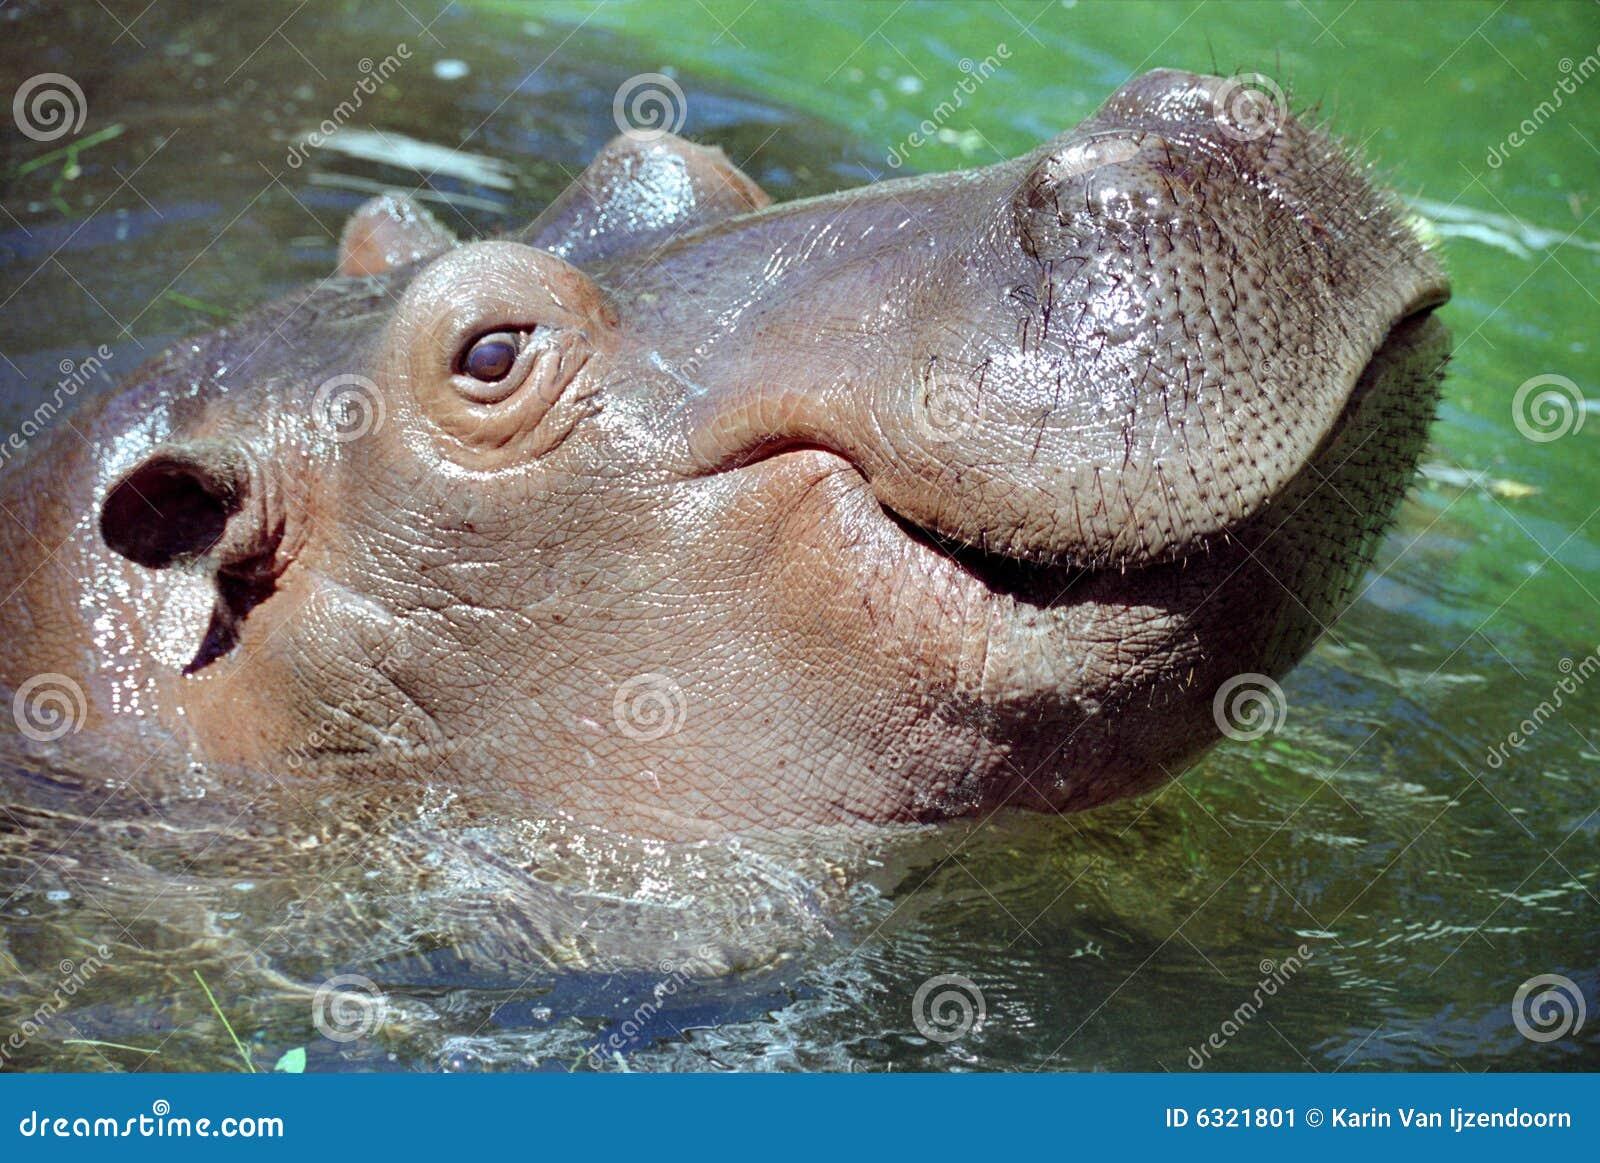 Sorriso do hipopótamo